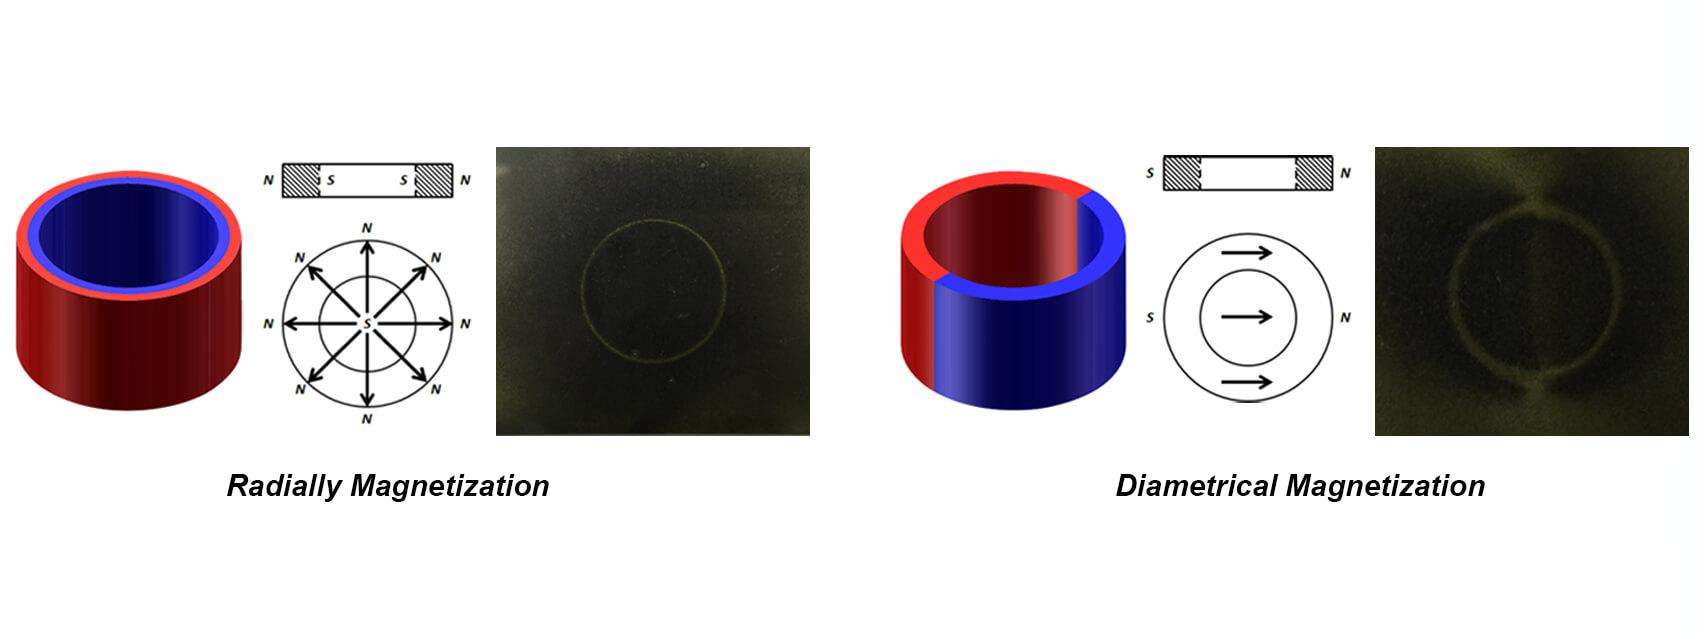 Imanes anulares de NdFeB orientados radialmente-1